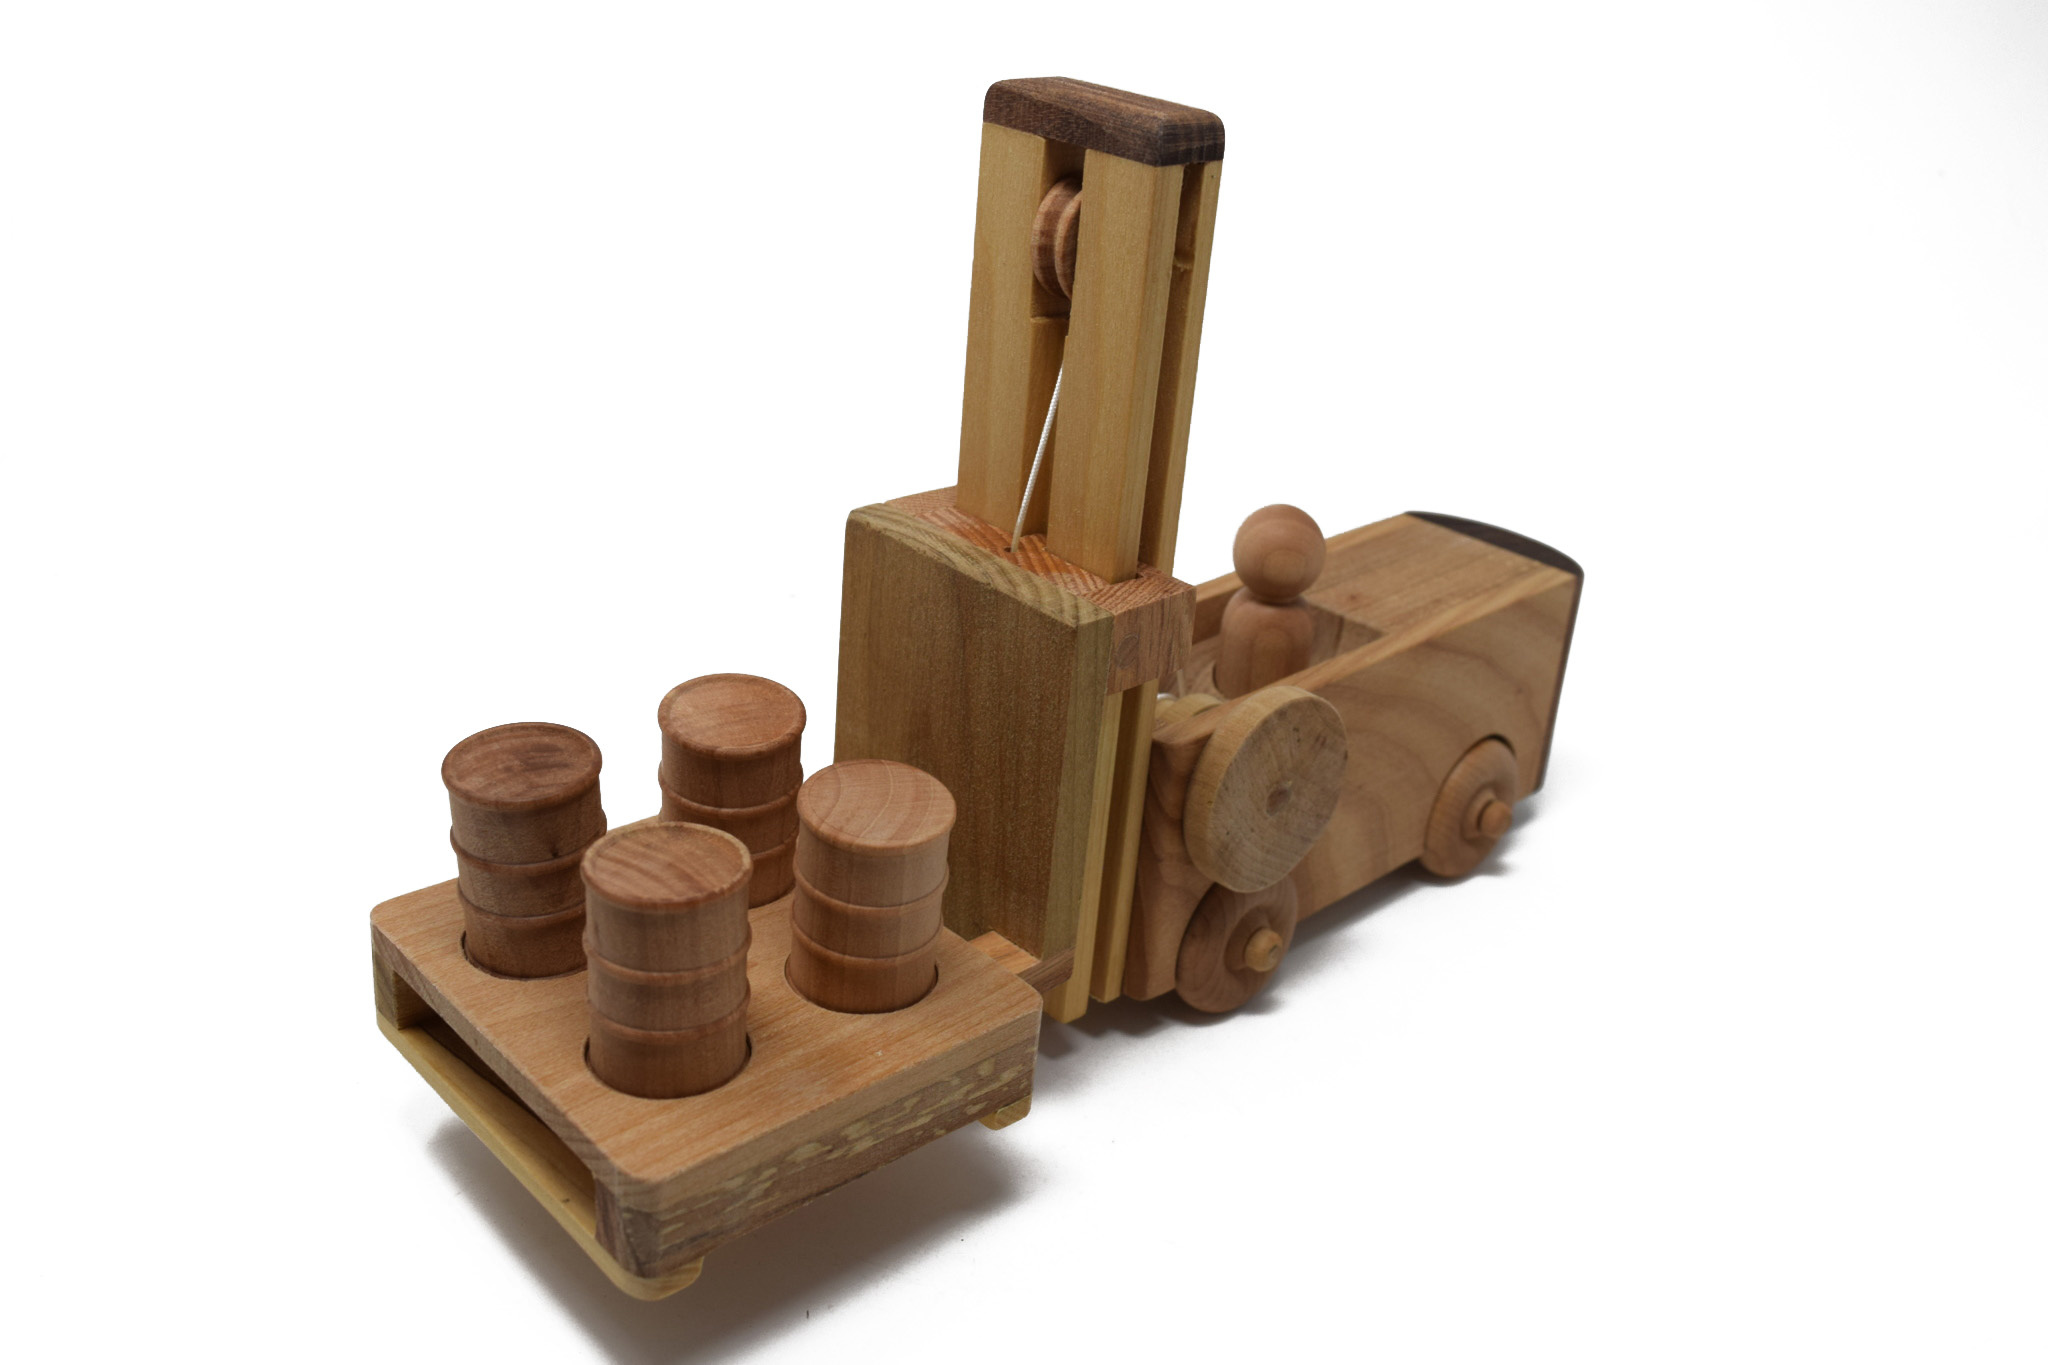 Wooden Forklift Toy-3